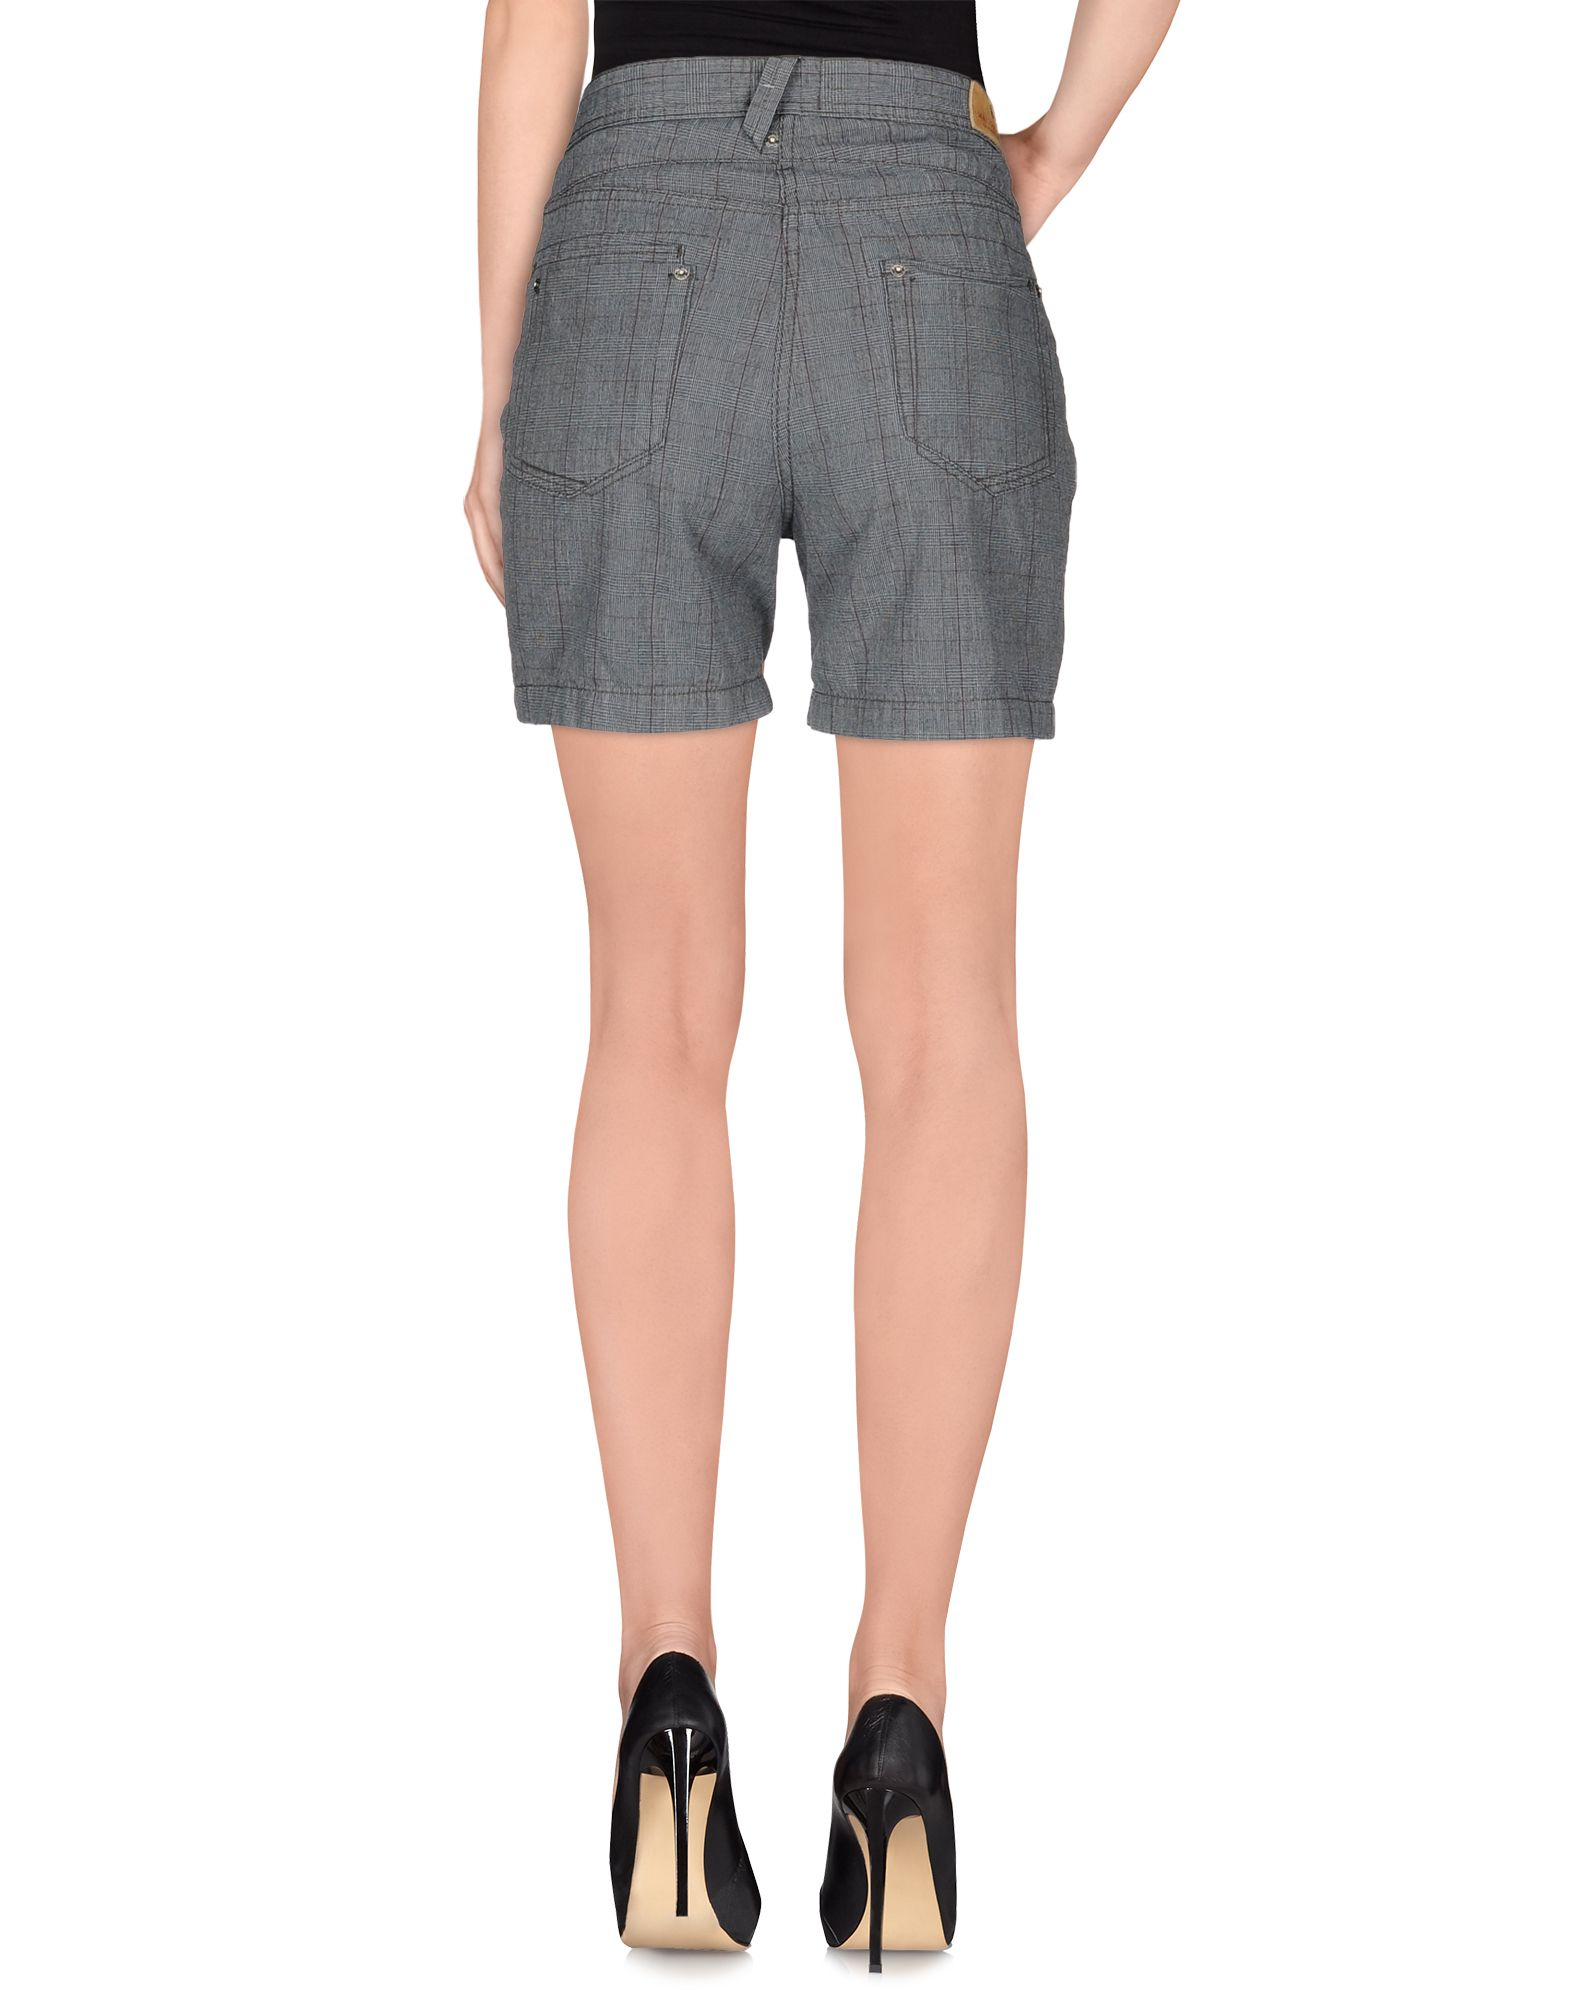 Lyst maison scotch shorts in gray for Atelier maison scotch